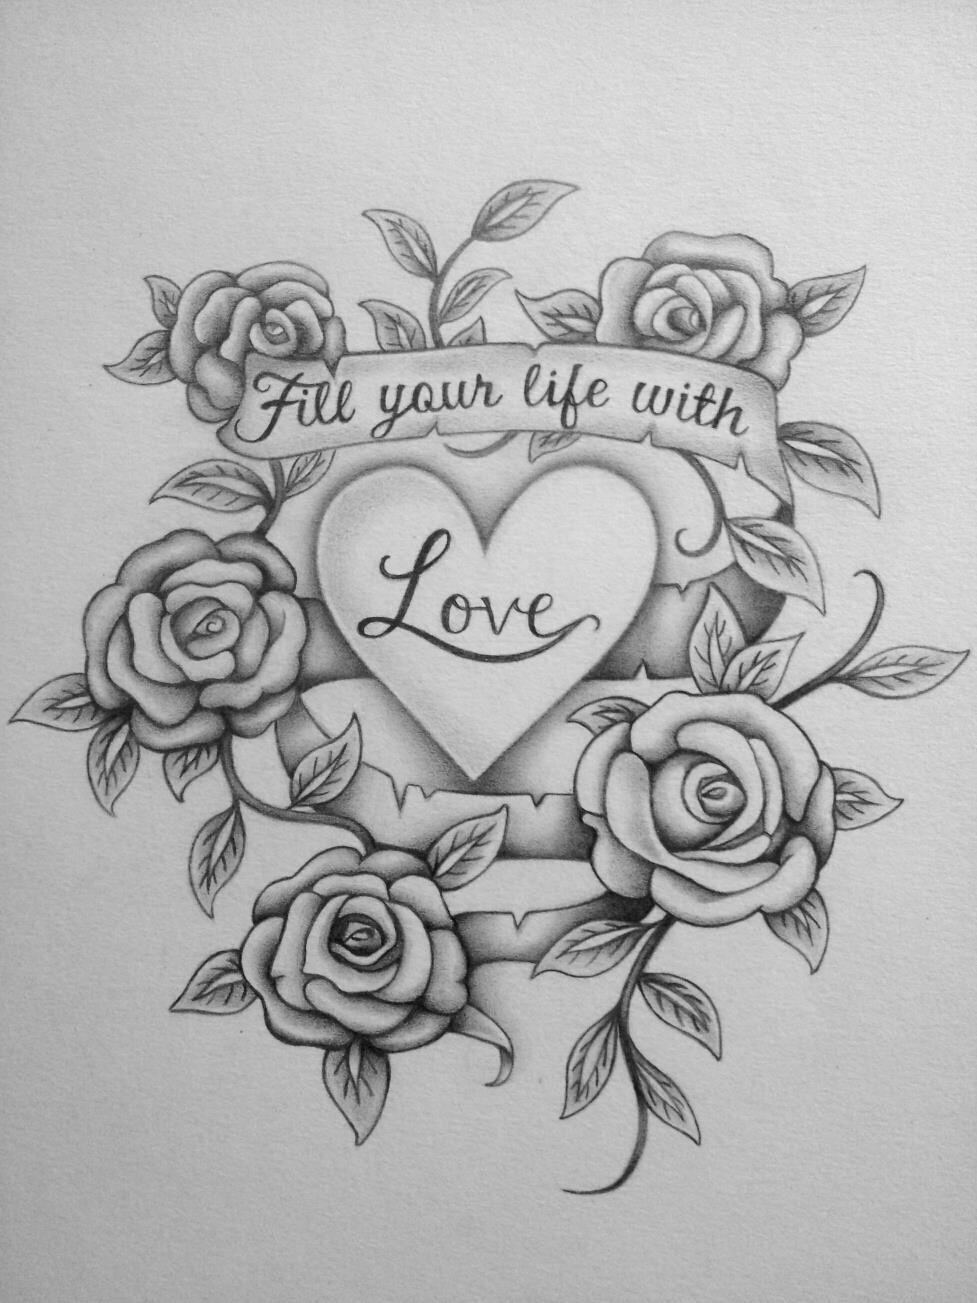 Pencil Drawings Realistic Portrait Art Sketches Realistic Pencil Drawings Fine Art A Tattoo Design Drawings Cute Drawings Of Love Love Drawings For Him